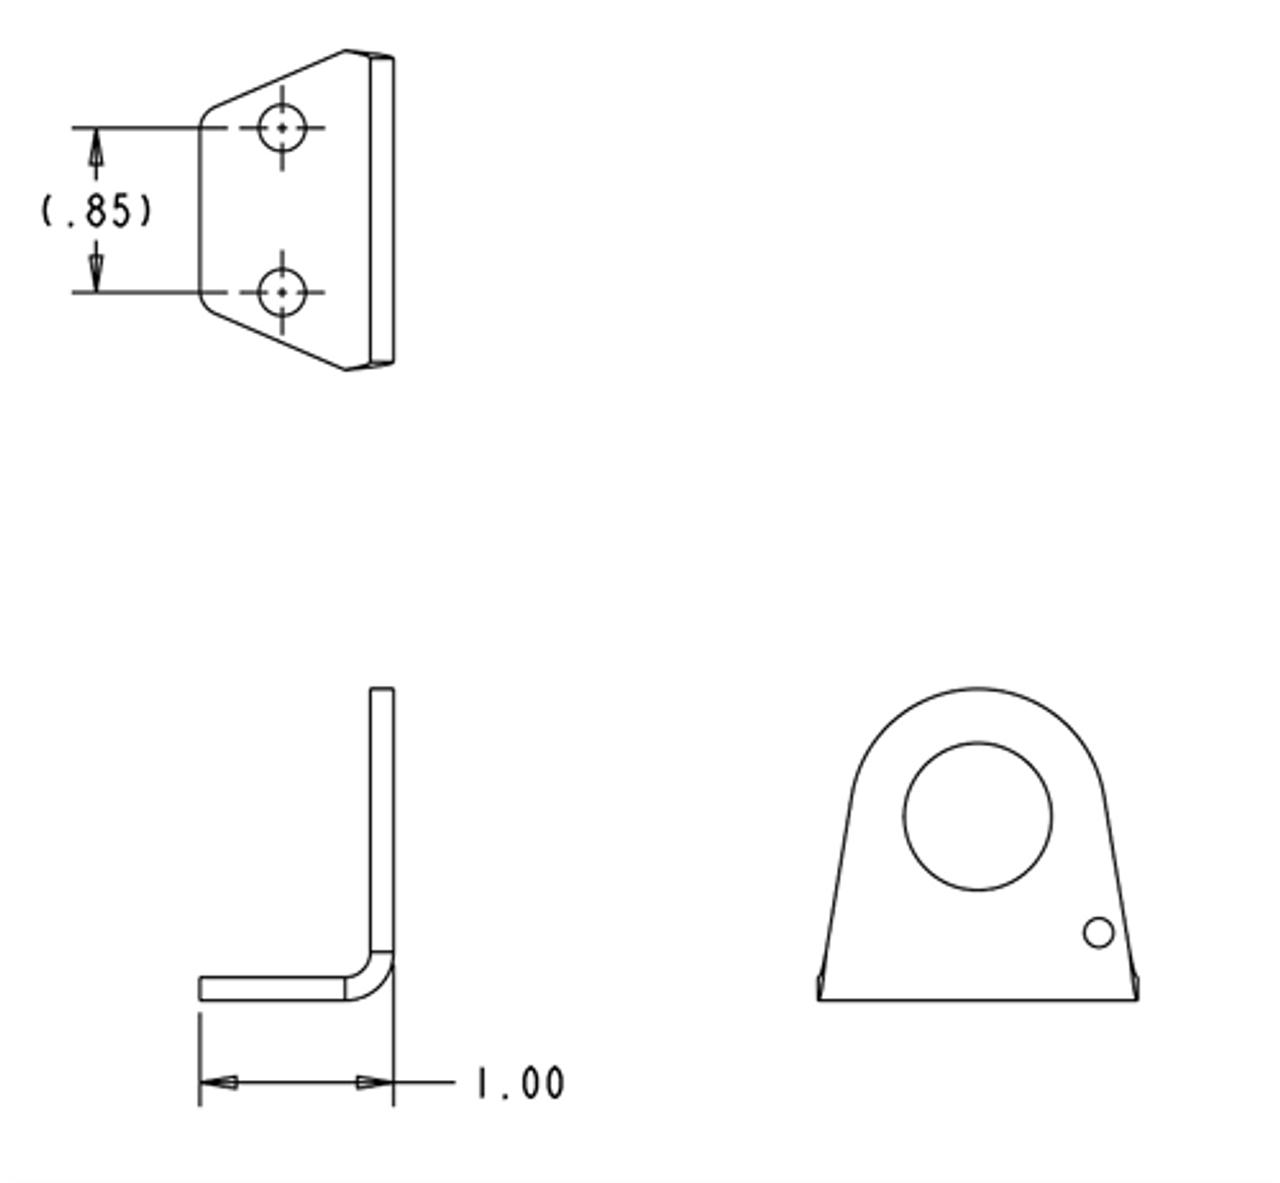 Air Coupler Bracket- flat KIT (ACB-1KIT) for On Board Air